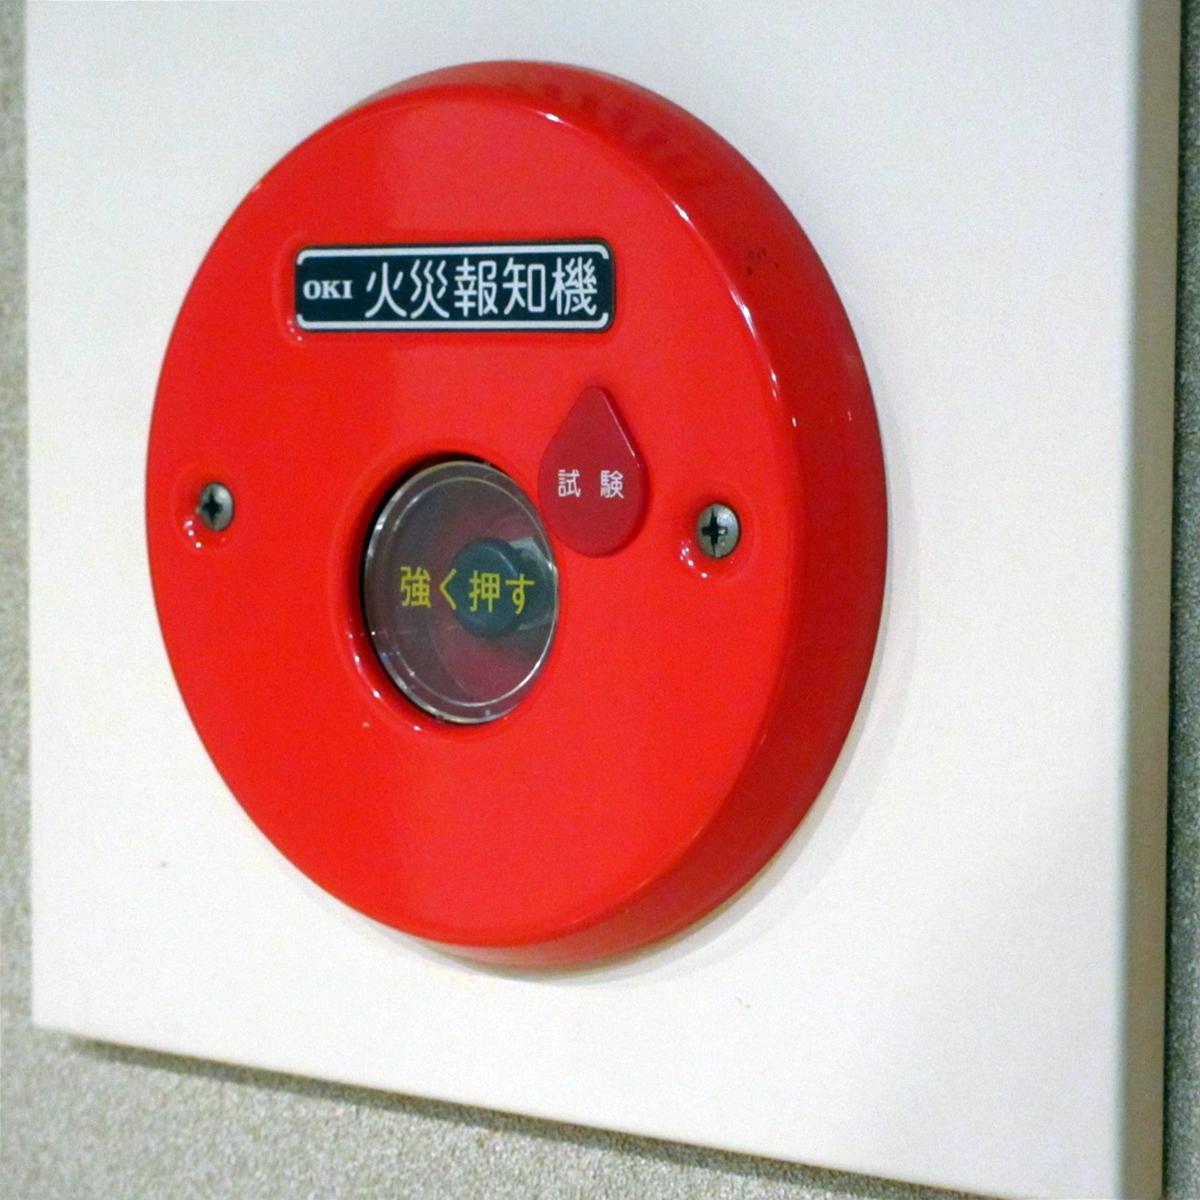 火災報知器・消火器・非常灯のフリー写真